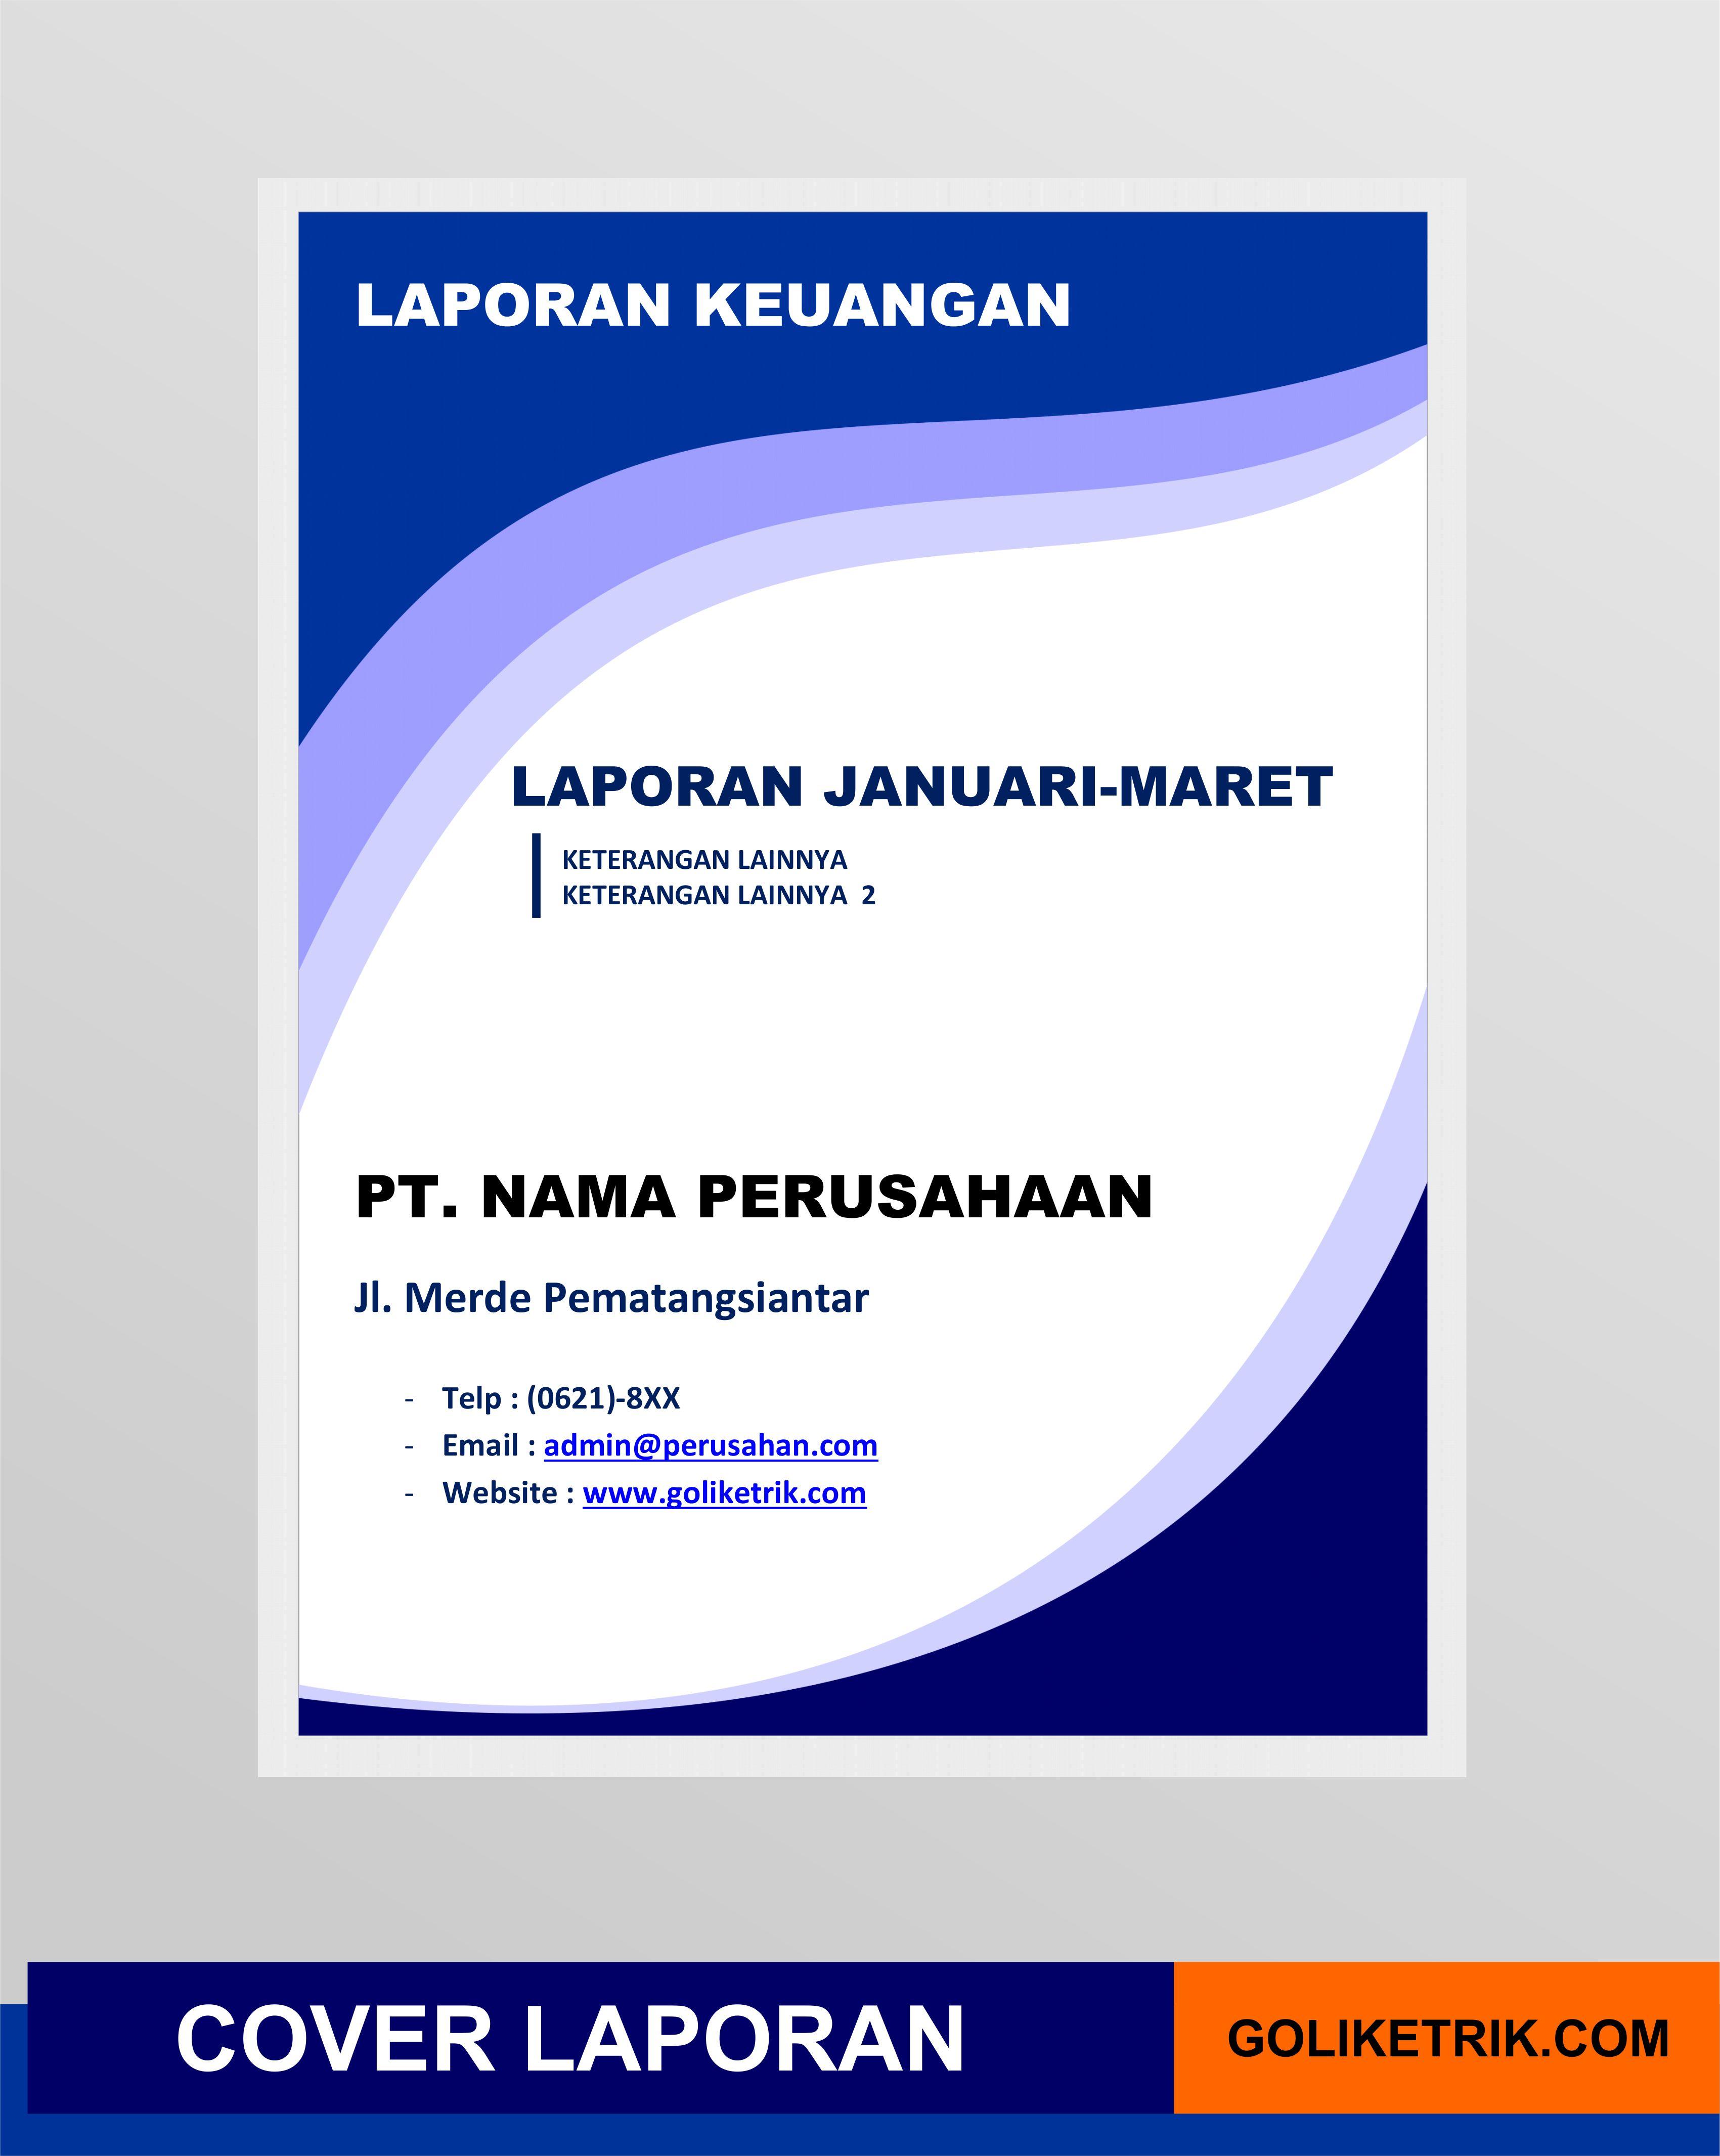 Cover Laporan Format Docx Word Versi 2 Di 2020 Keuangan Buku Laporan Keuangan